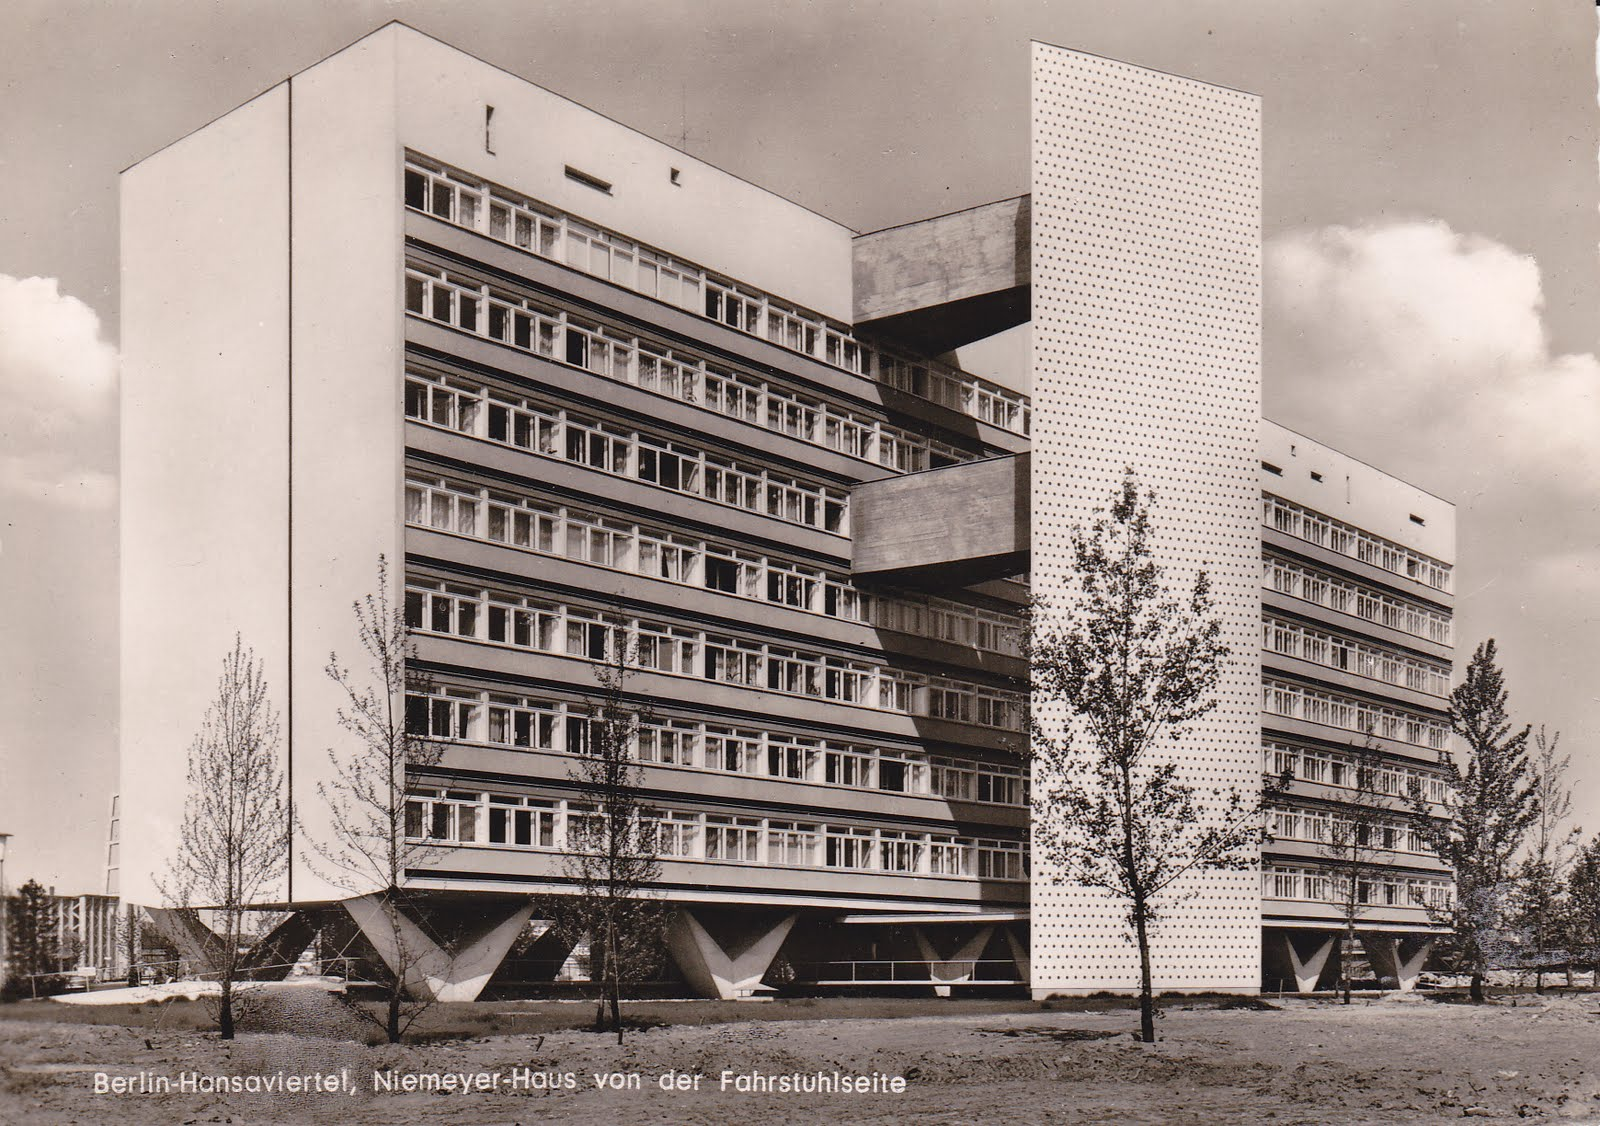 postales inventadas making up postcards 836 berlin hansaviertel niemeyer haus van der. Black Bedroom Furniture Sets. Home Design Ideas